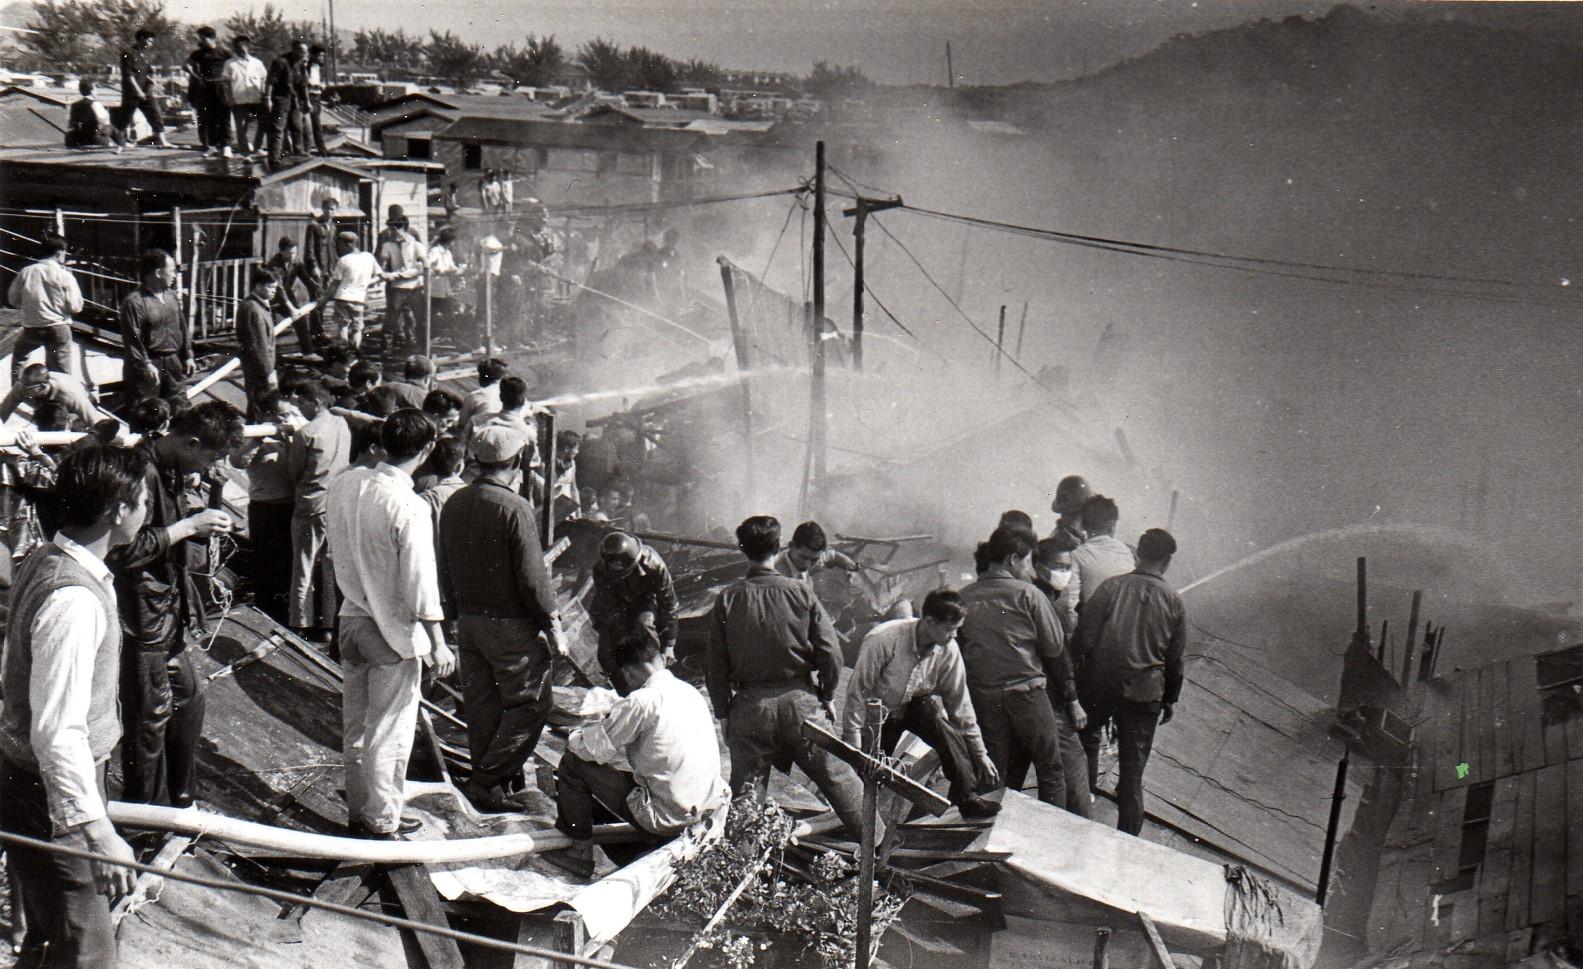 A05-1 街坊們協助消防人員奮力撲火